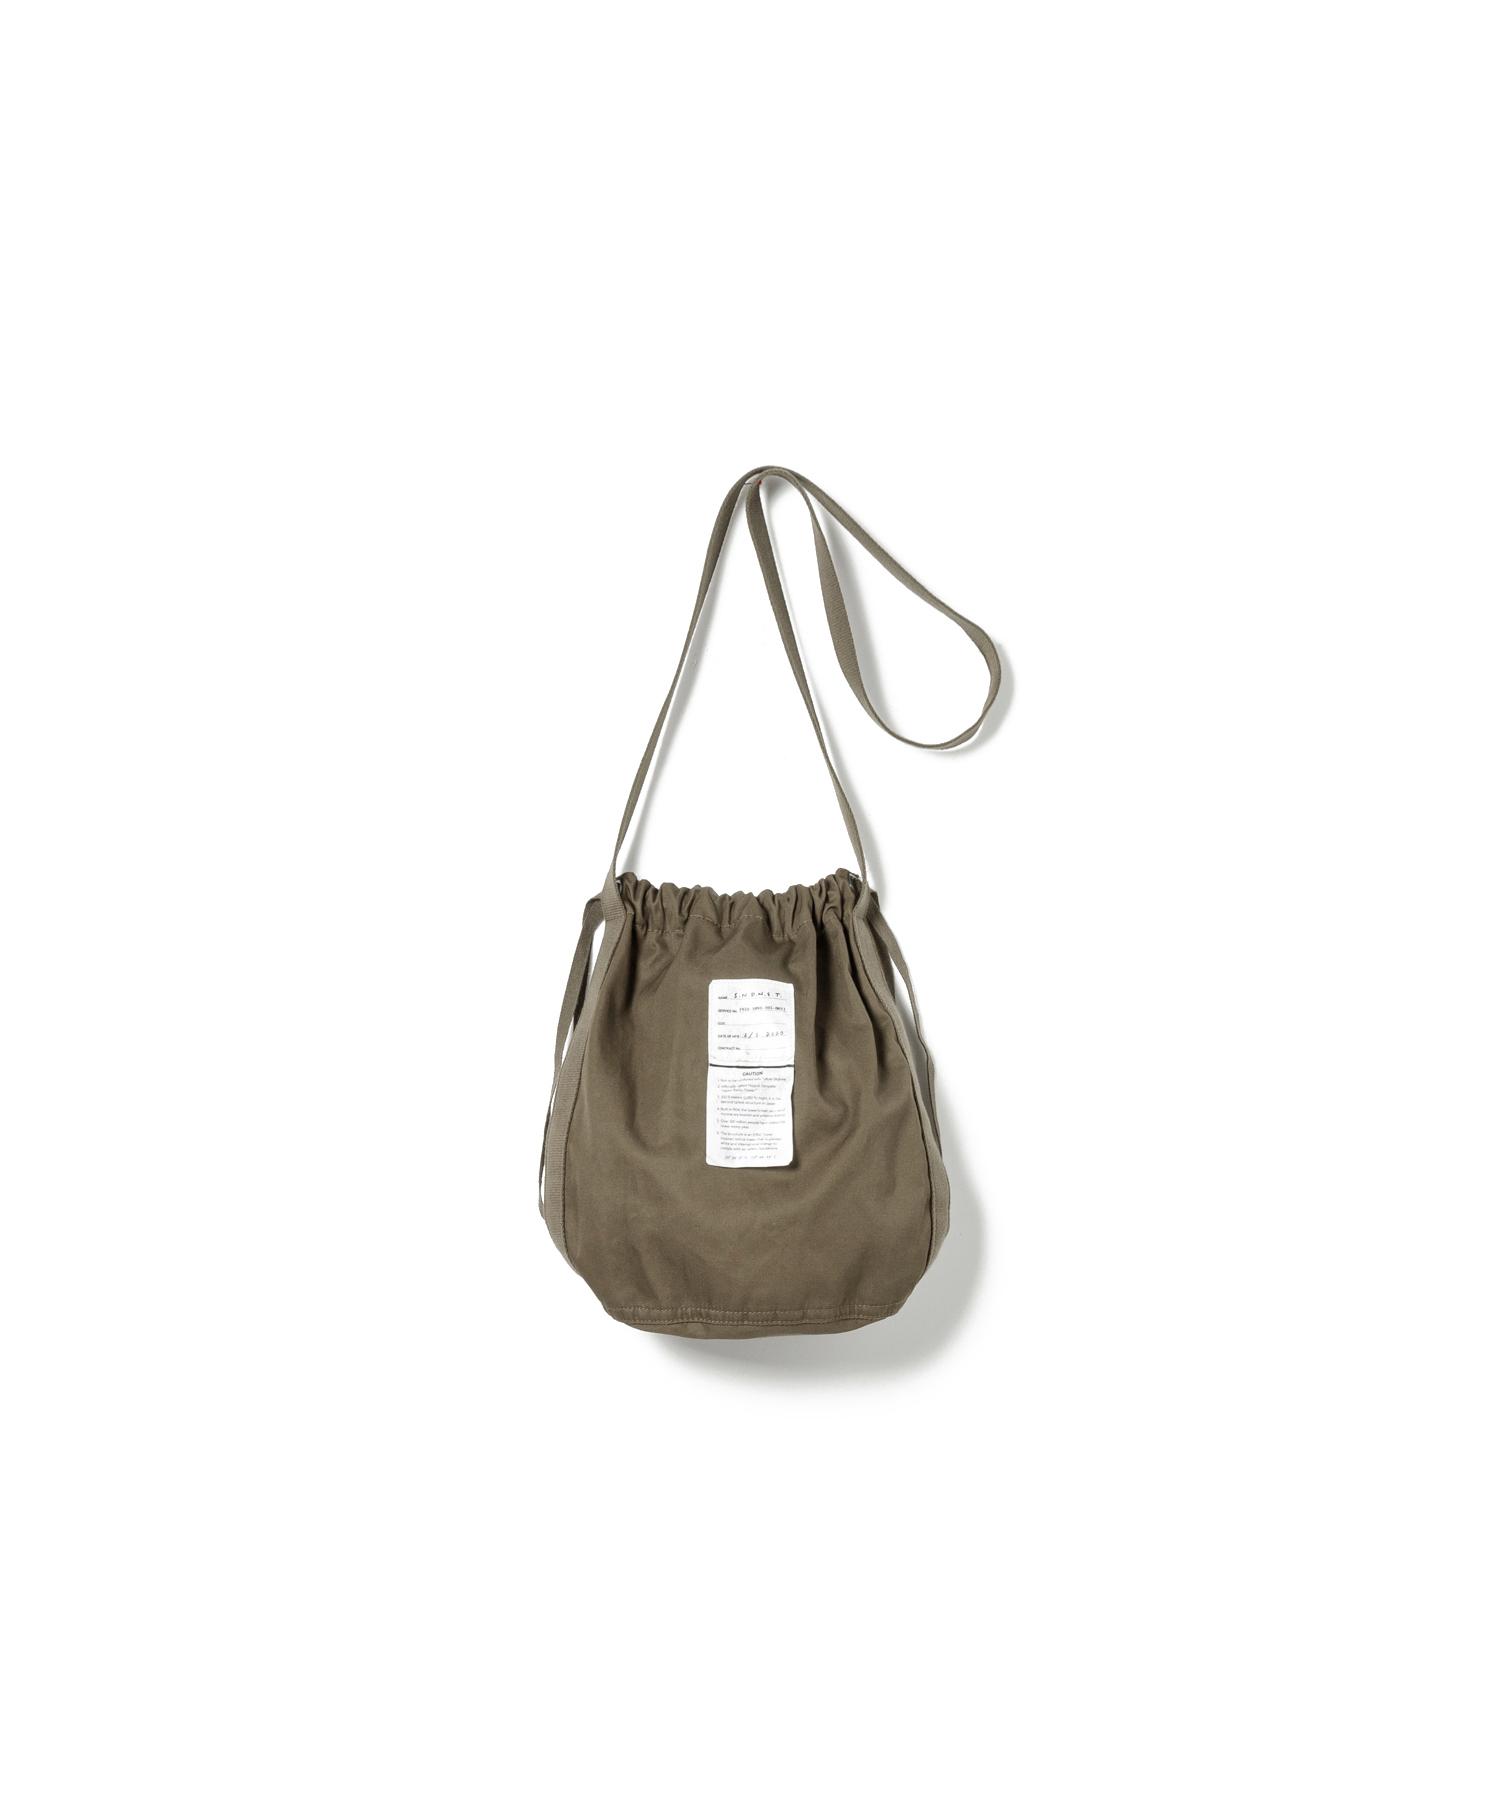 【SANDINISTA】Ventile Drawstring Bag(KHAKI)